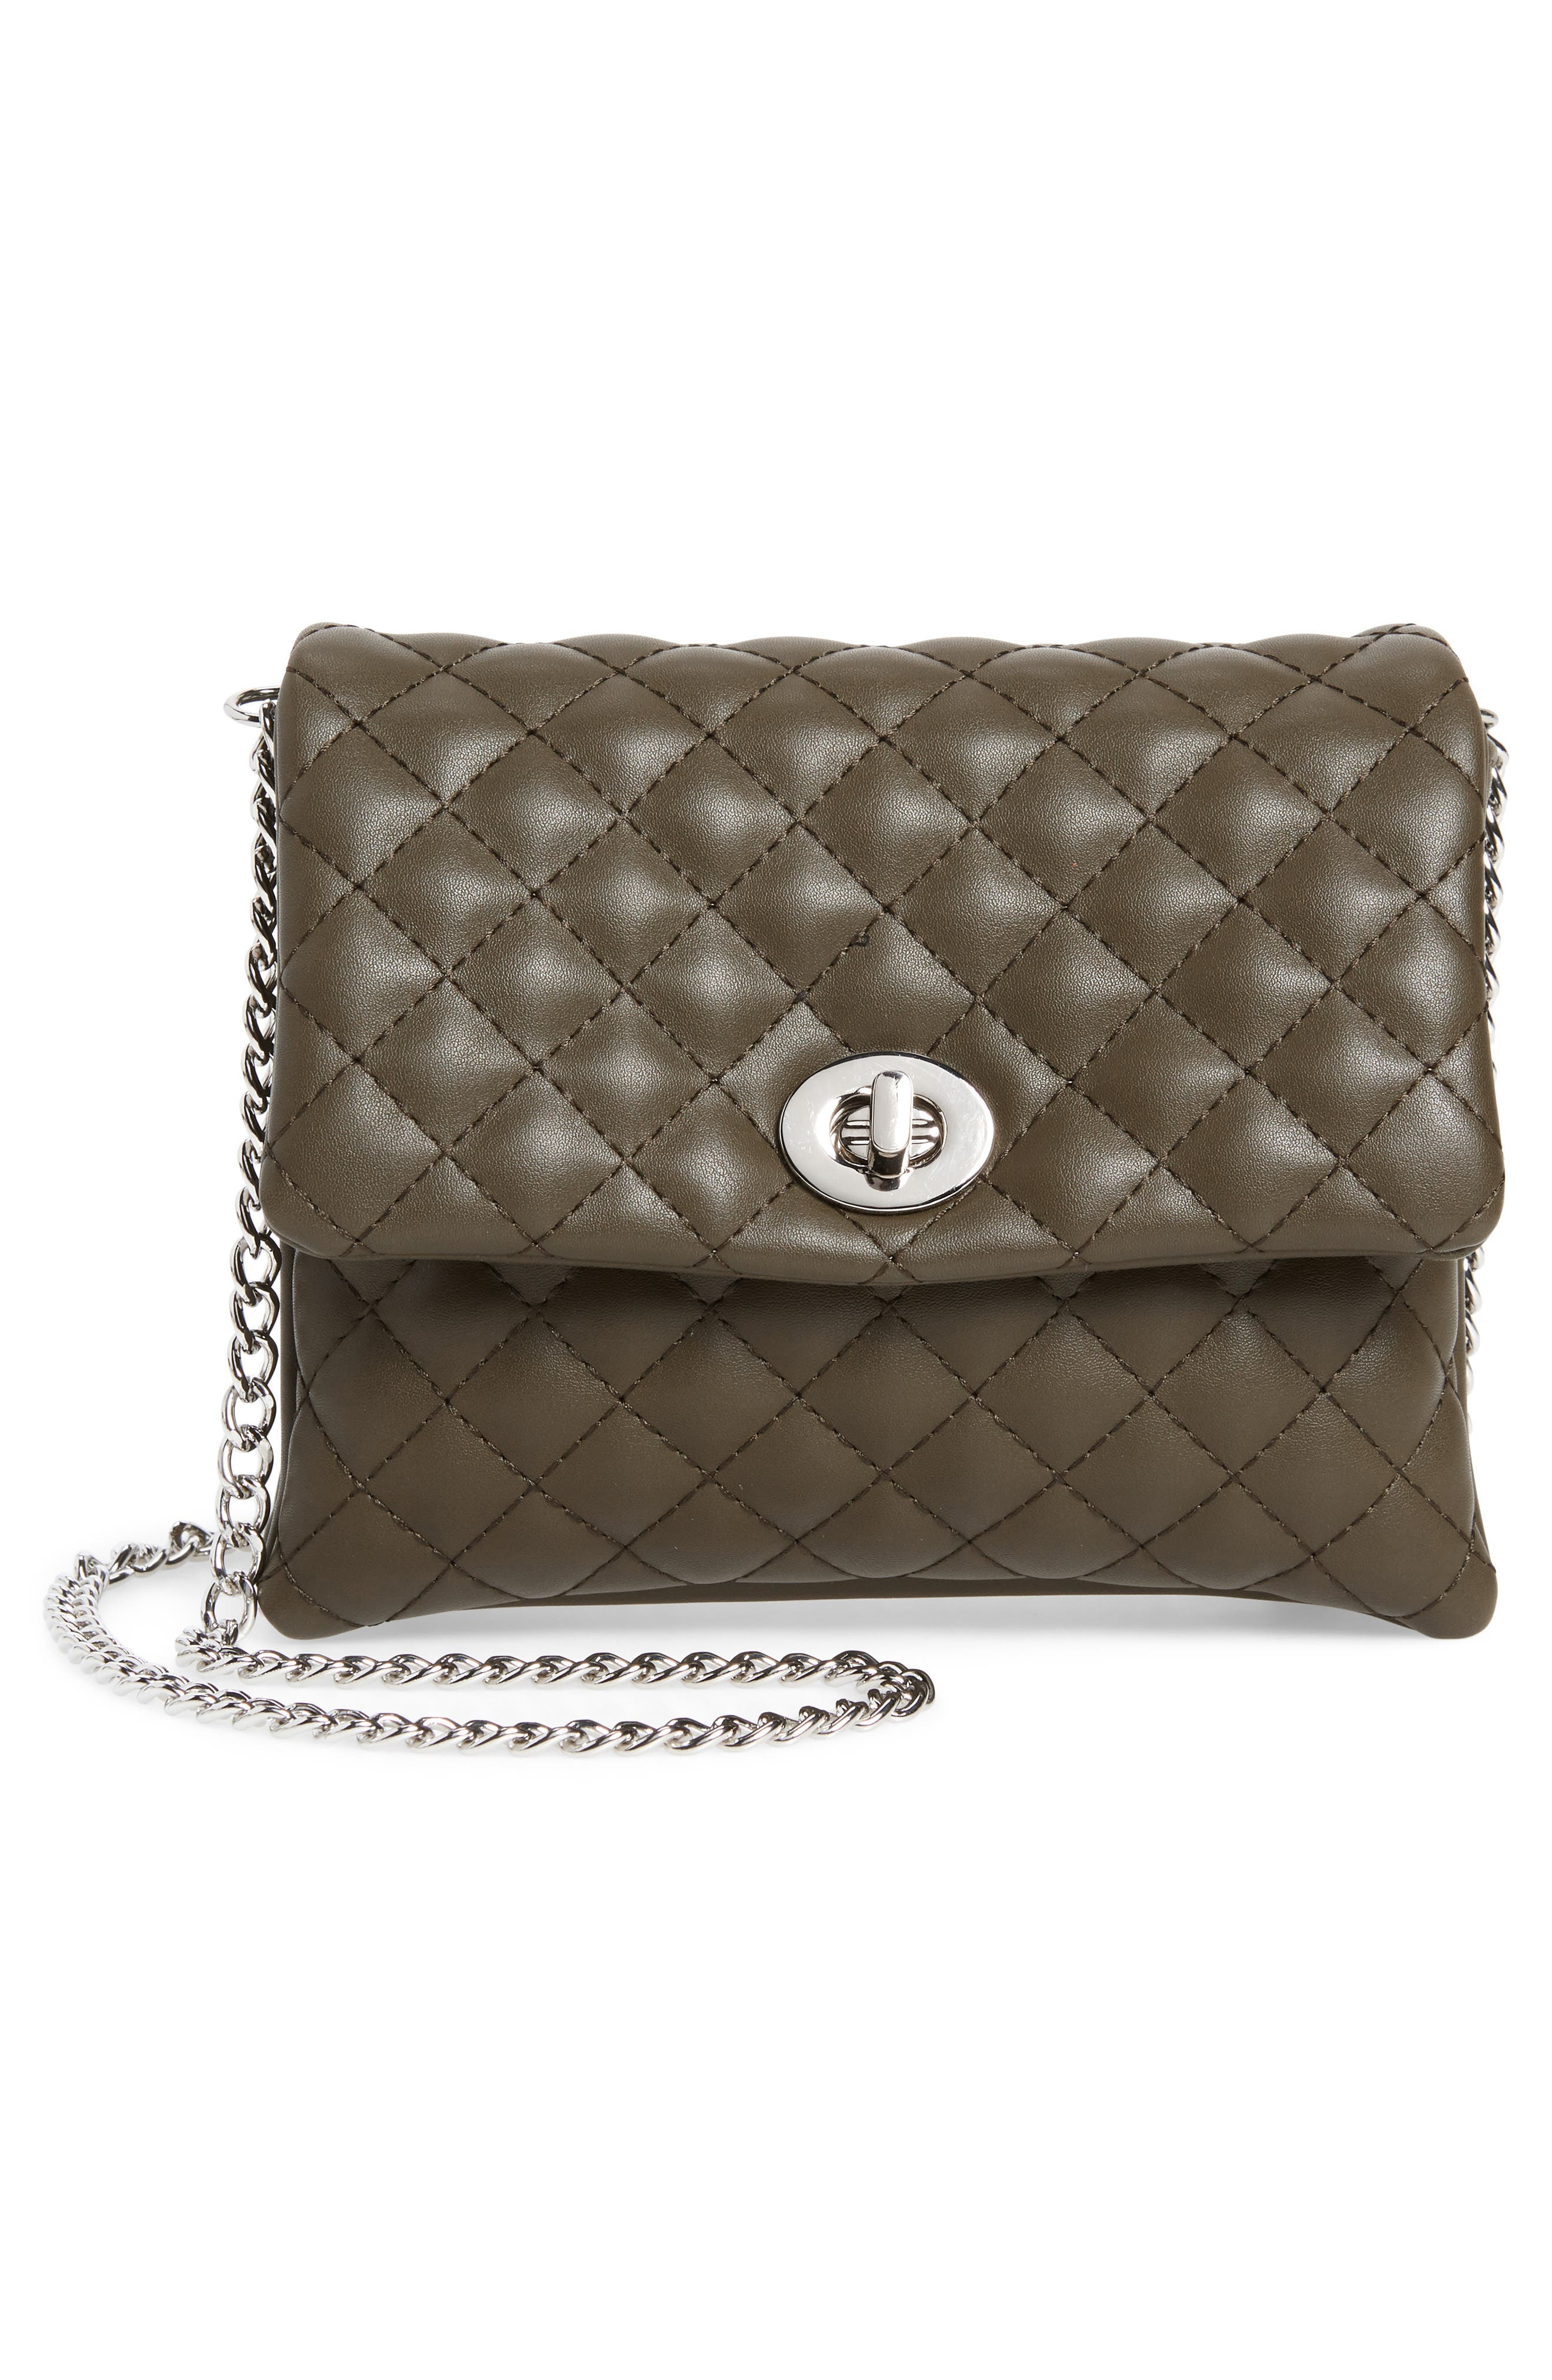 Mali + Lili Quilted Vegan Leather Convertible Belt Bag,                             Alternate thumbnail 4, color,                             OLIVE